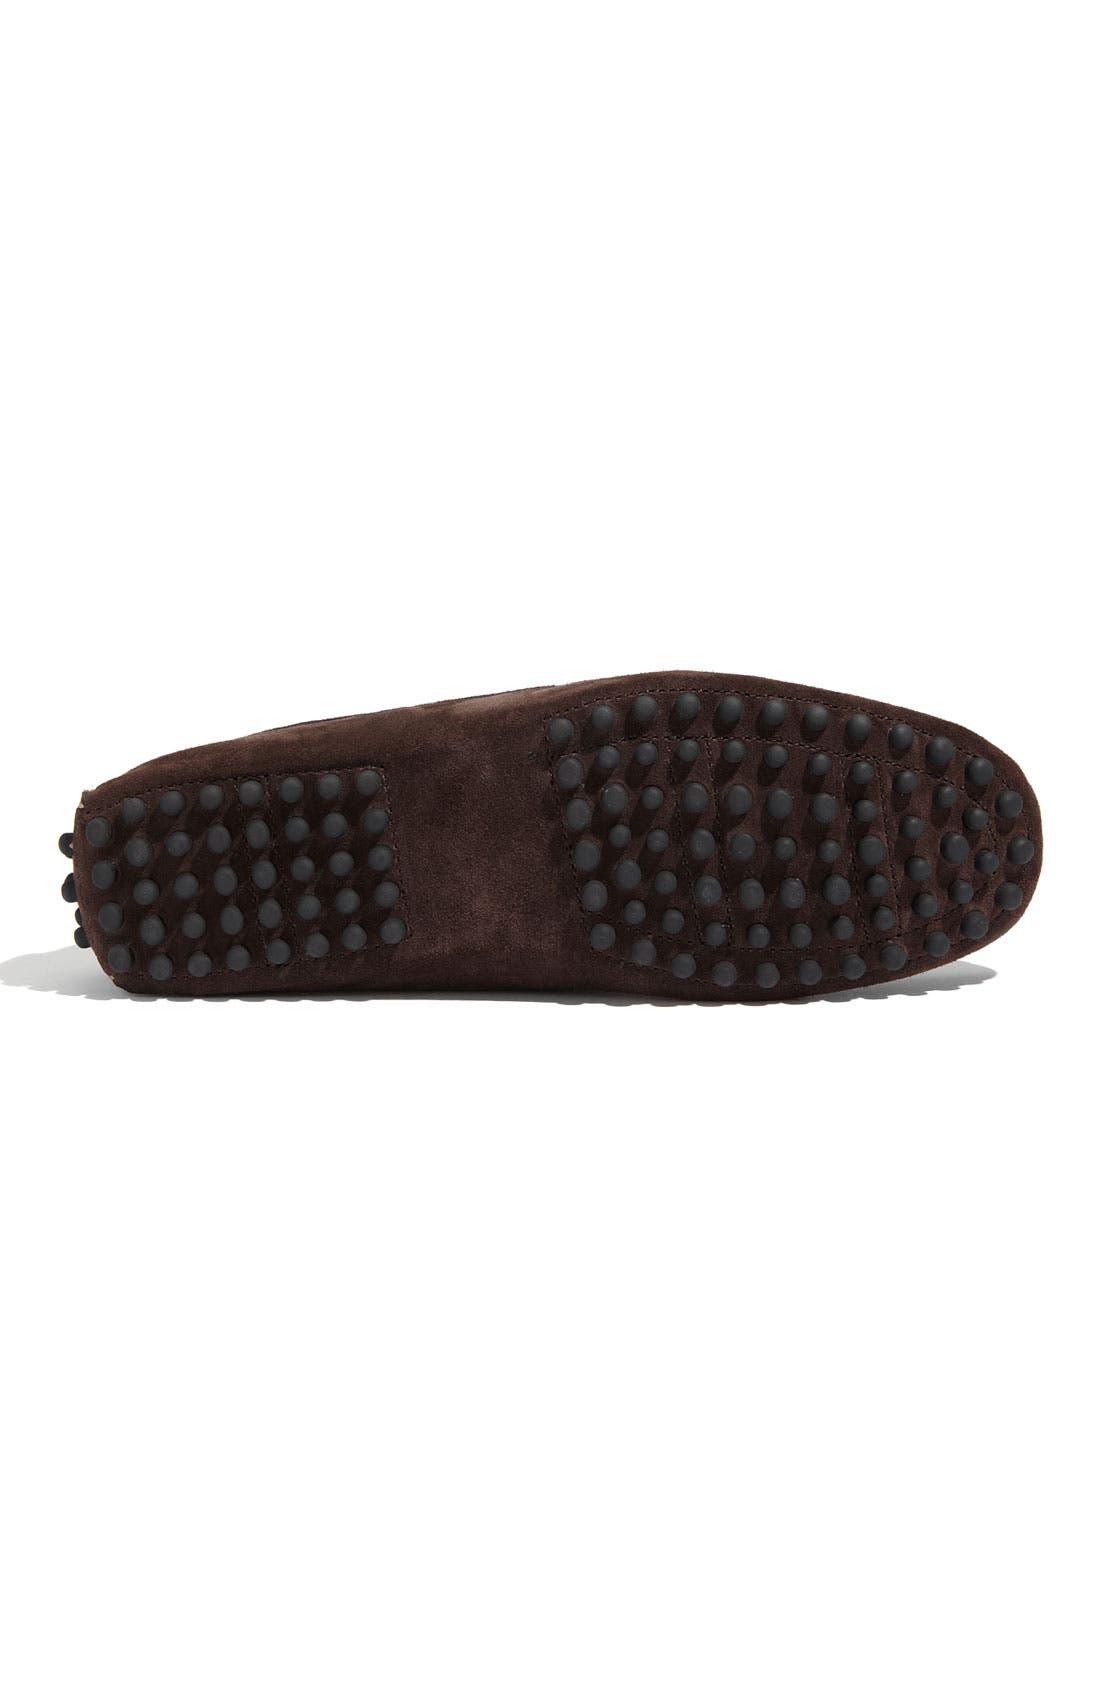 'Tobago' Driving Shoe,                             Alternate thumbnail 3, color,                             Brown